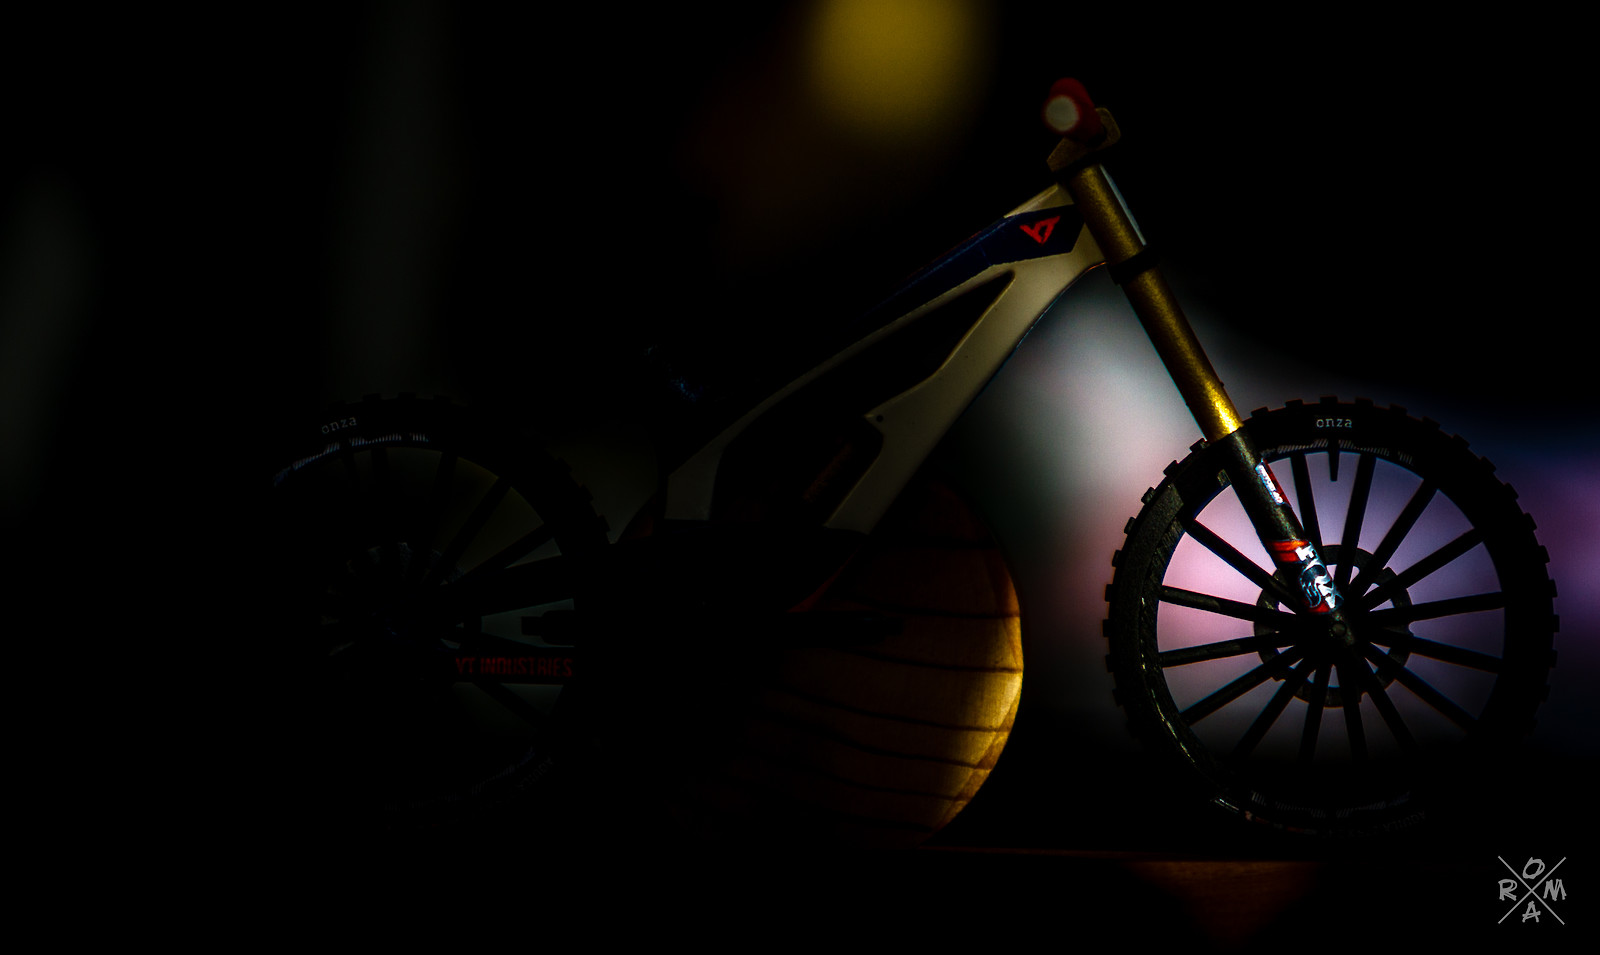 IMG 7840 - tomflemmig - Mountain Biking Pictures - Vital MTB